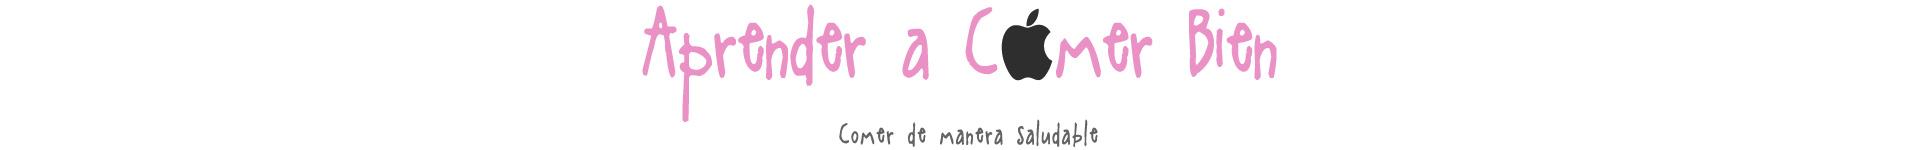 cabecera_blog